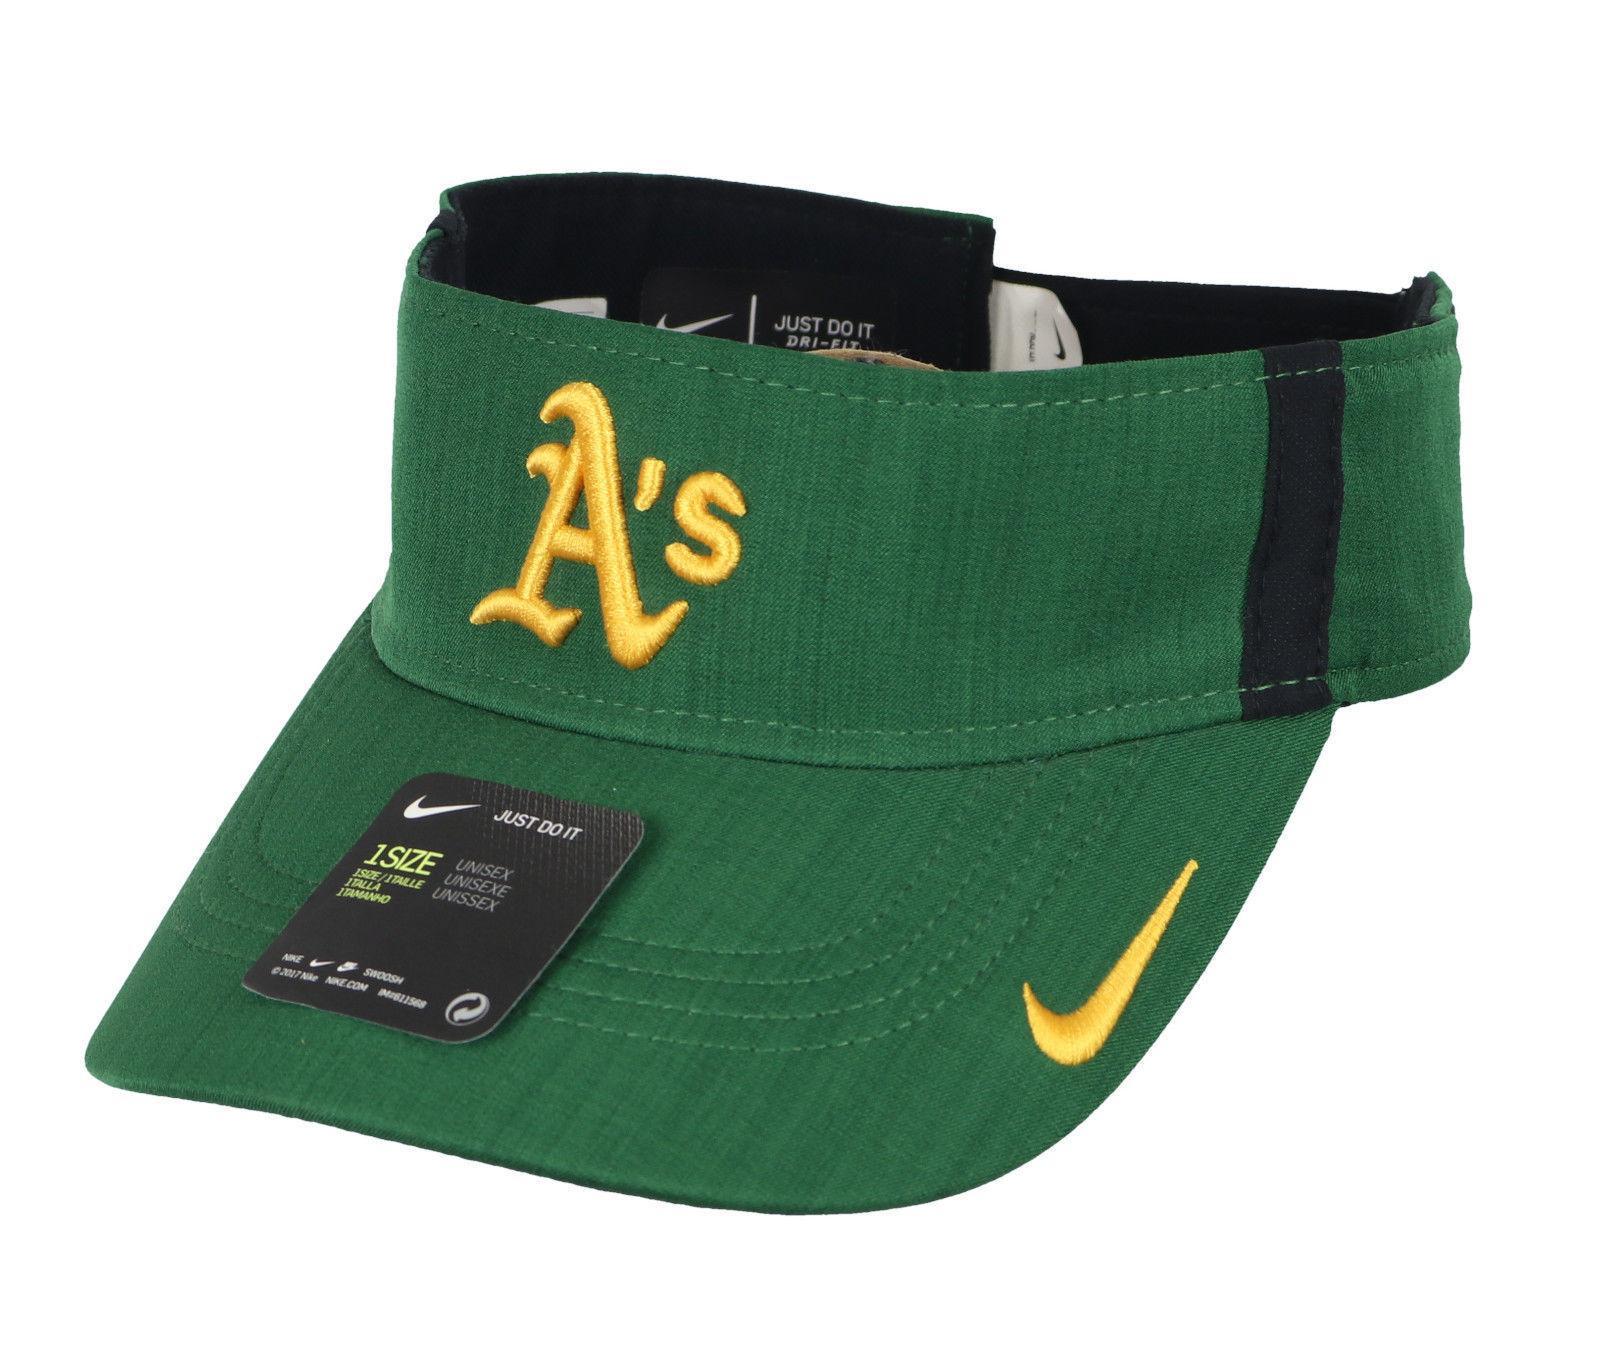 quality design 2f617 14435 S l1600. S l1600. Previous. NIKE Oakland Athletics AeroBill Vapor Visor One  Size Green Yellow Hat Cap A s